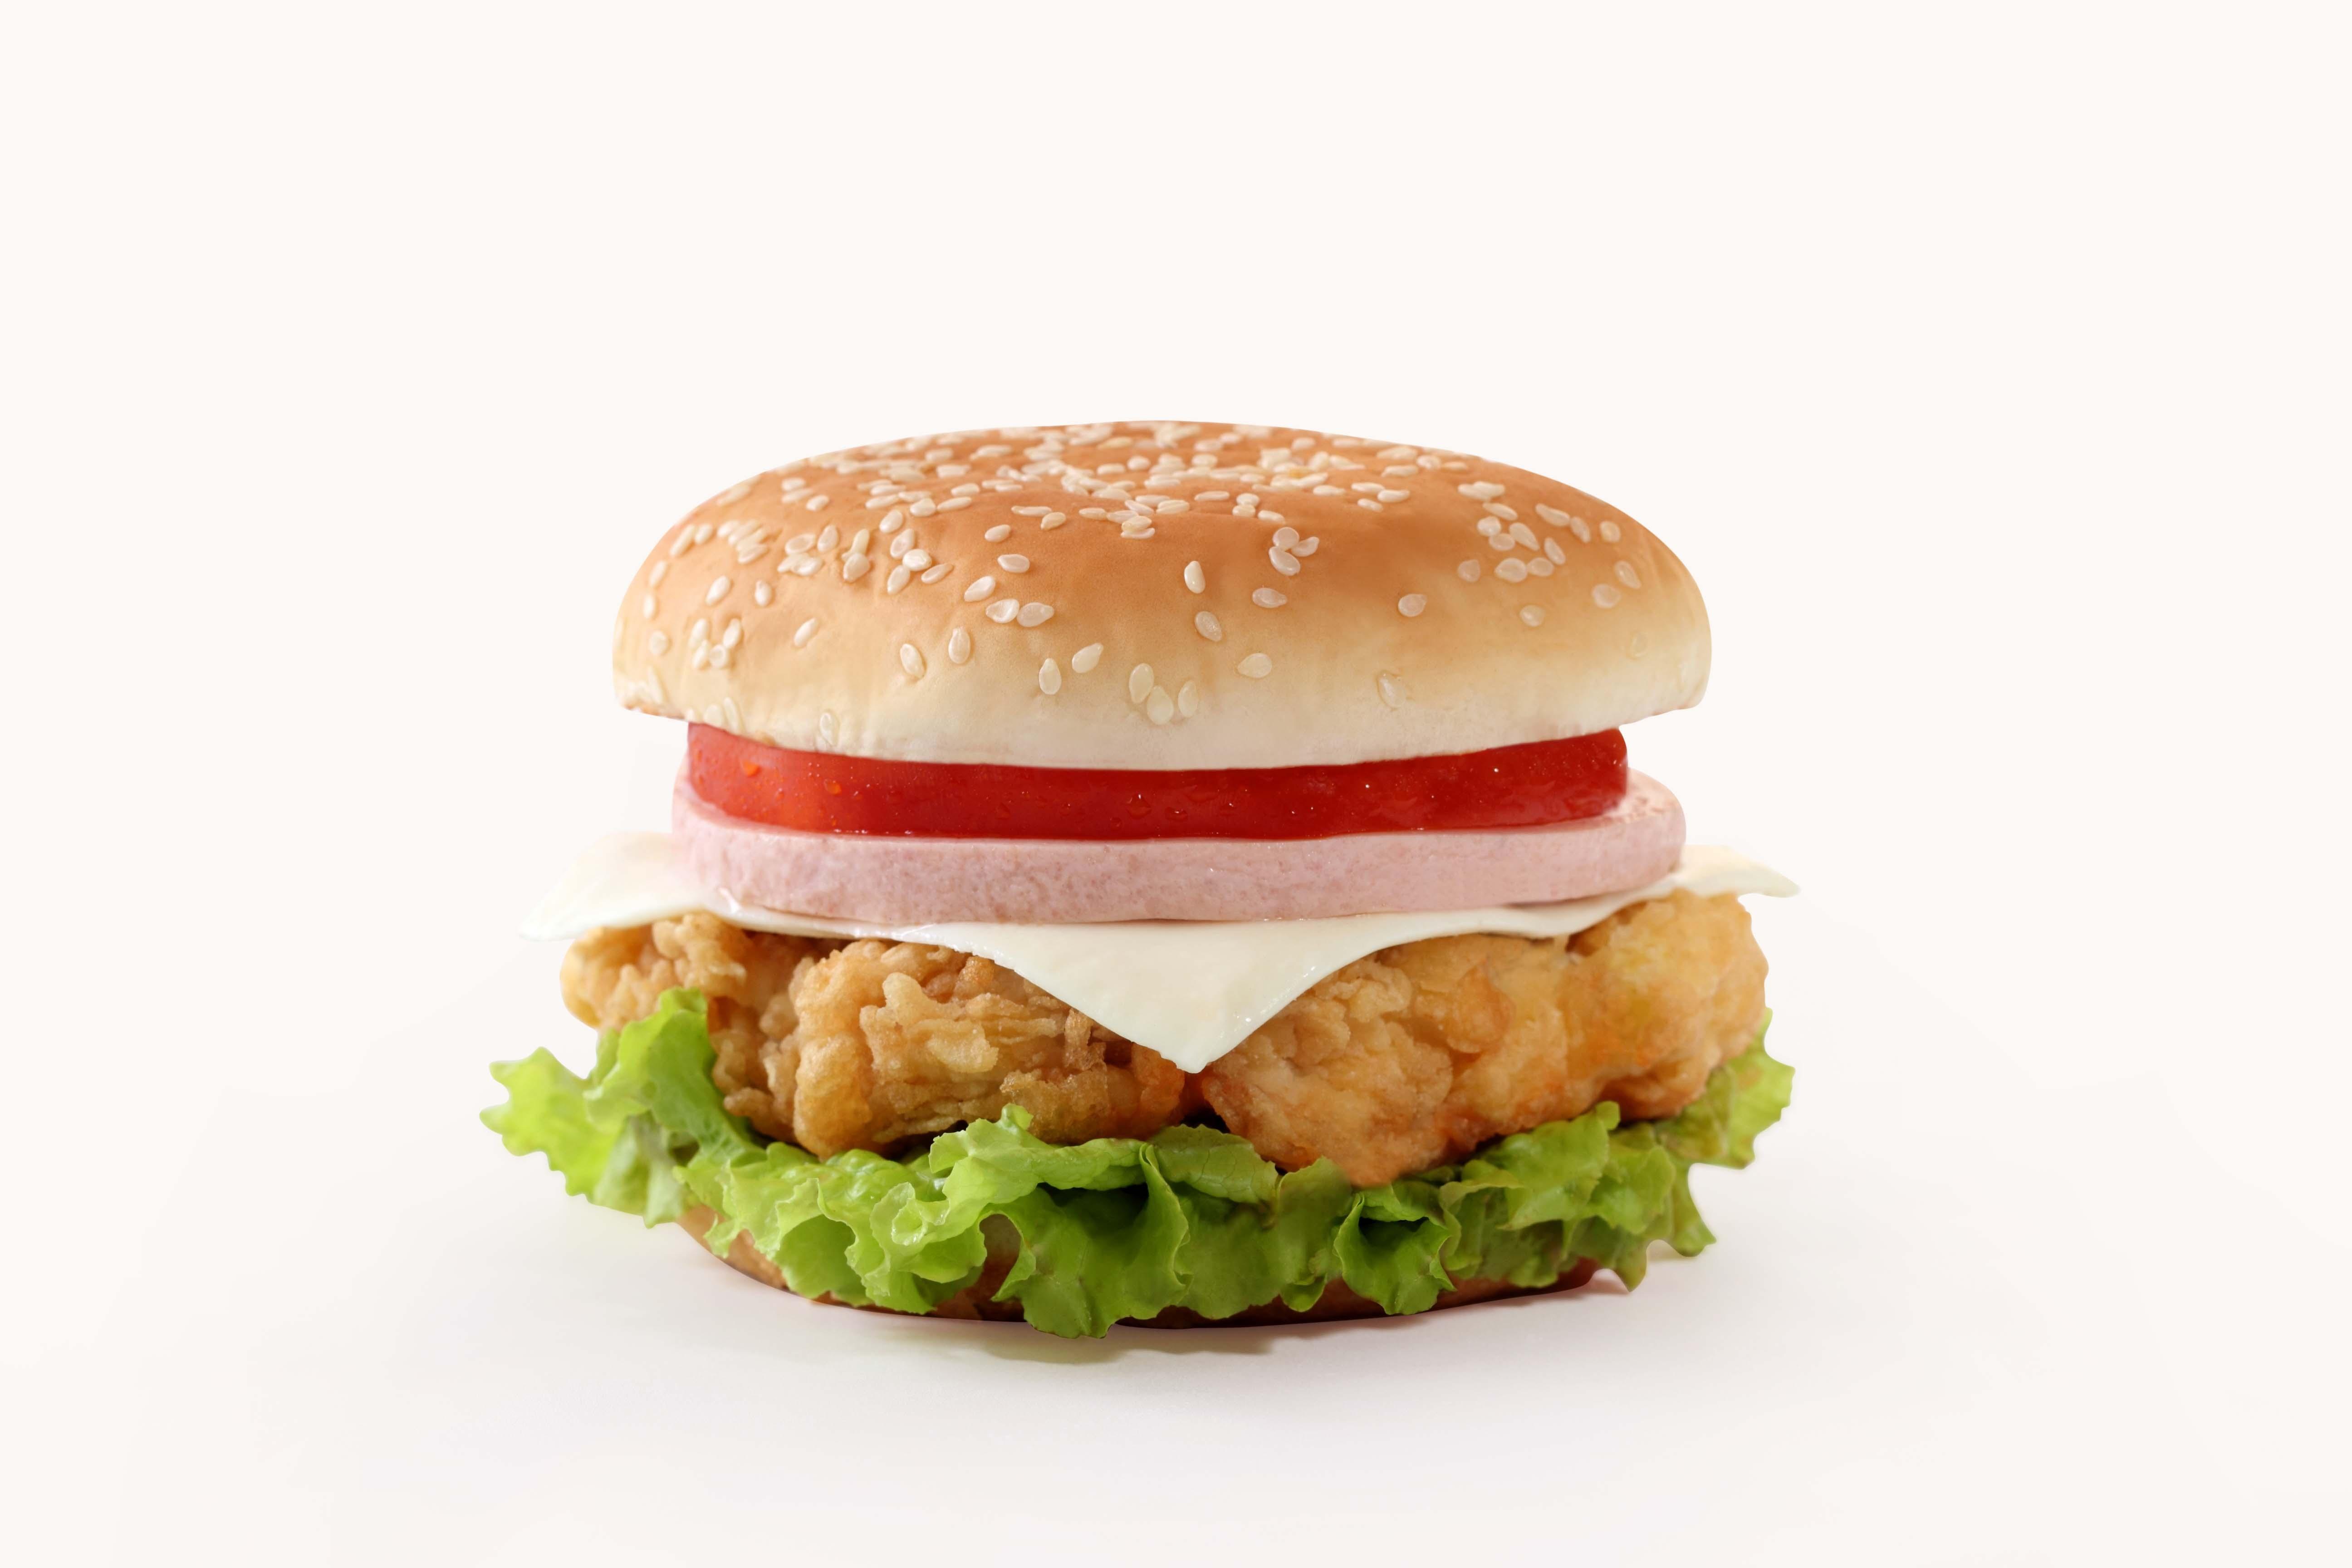 вредные гамбургеры картинки того